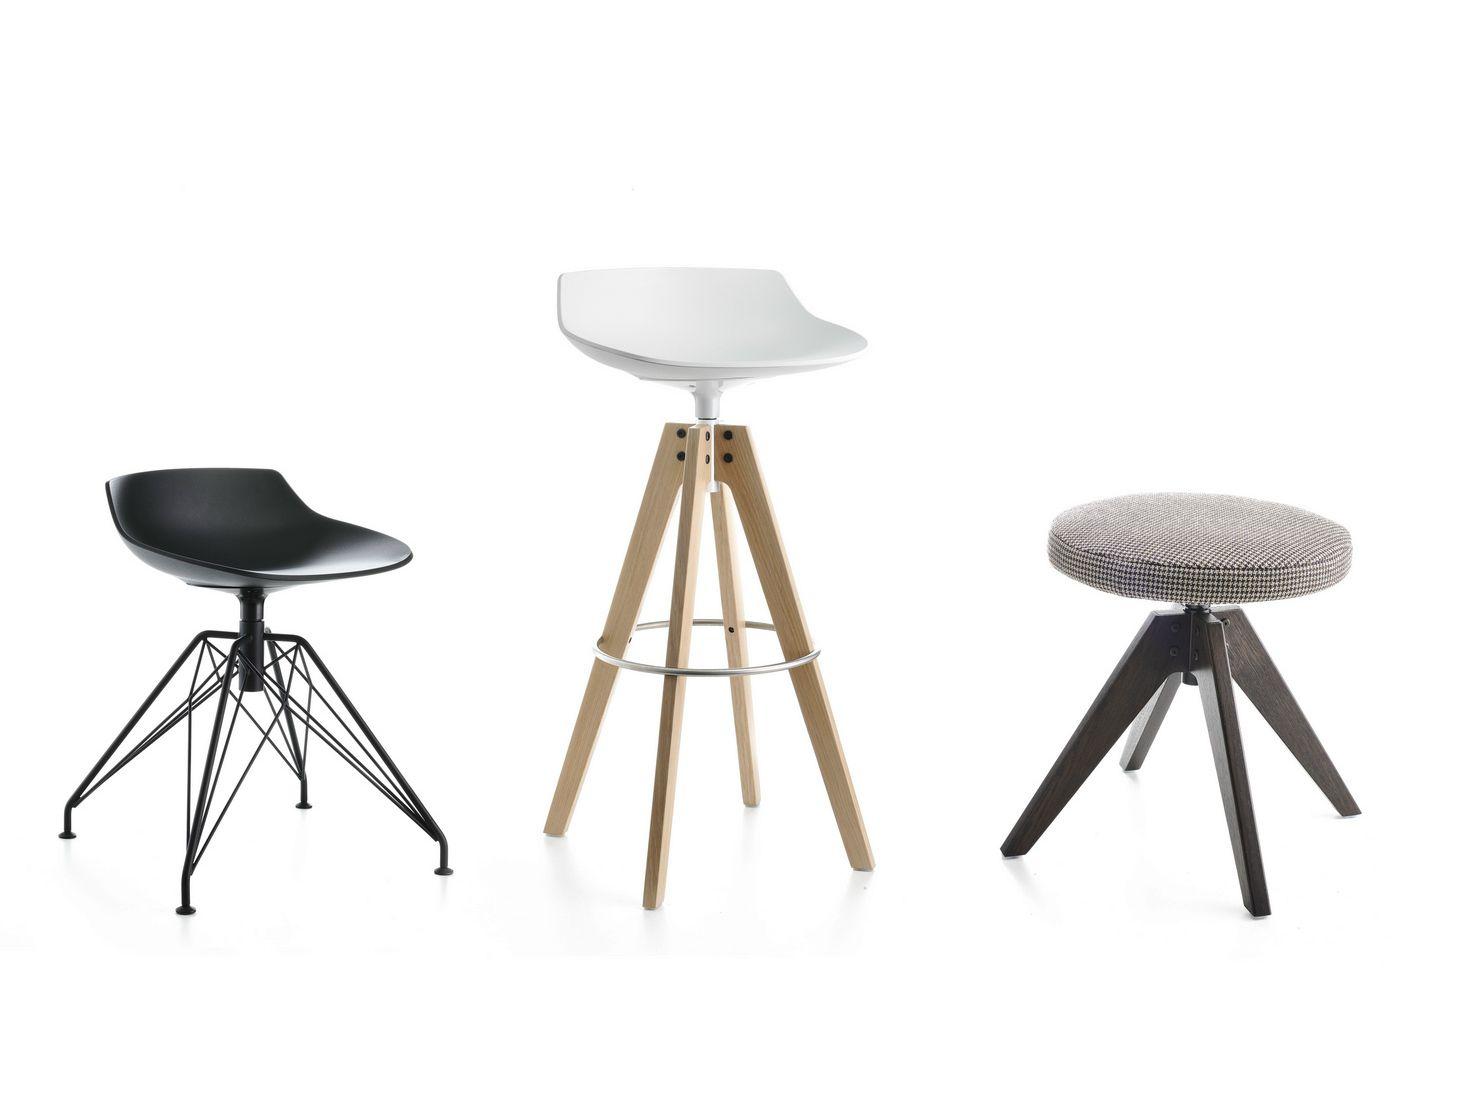 flow stool tabouret pivotant by mdf italia design jean marie massaud. Black Bedroom Furniture Sets. Home Design Ideas